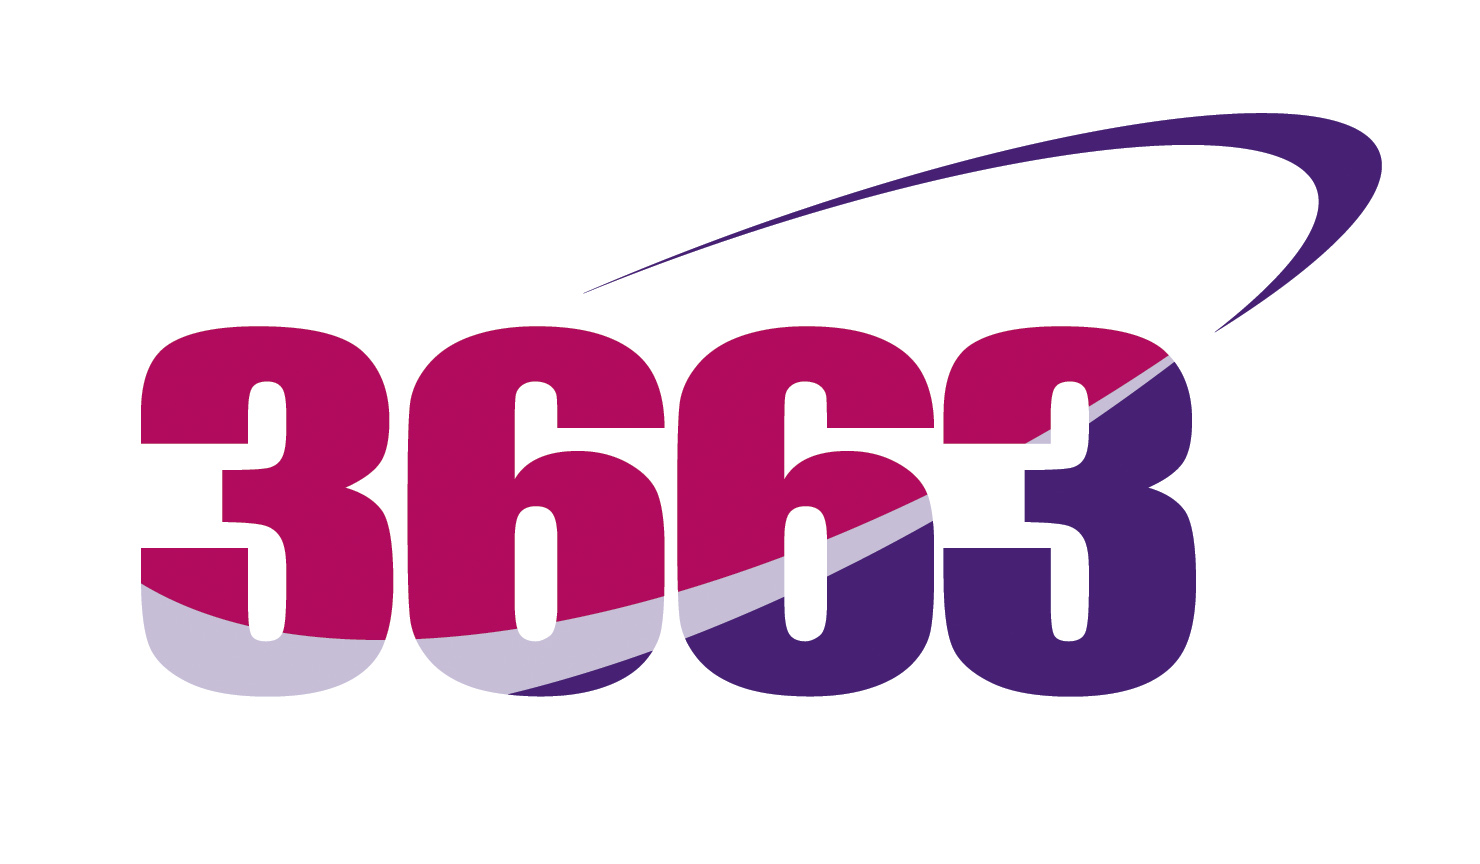 3663-logo-0.jpg